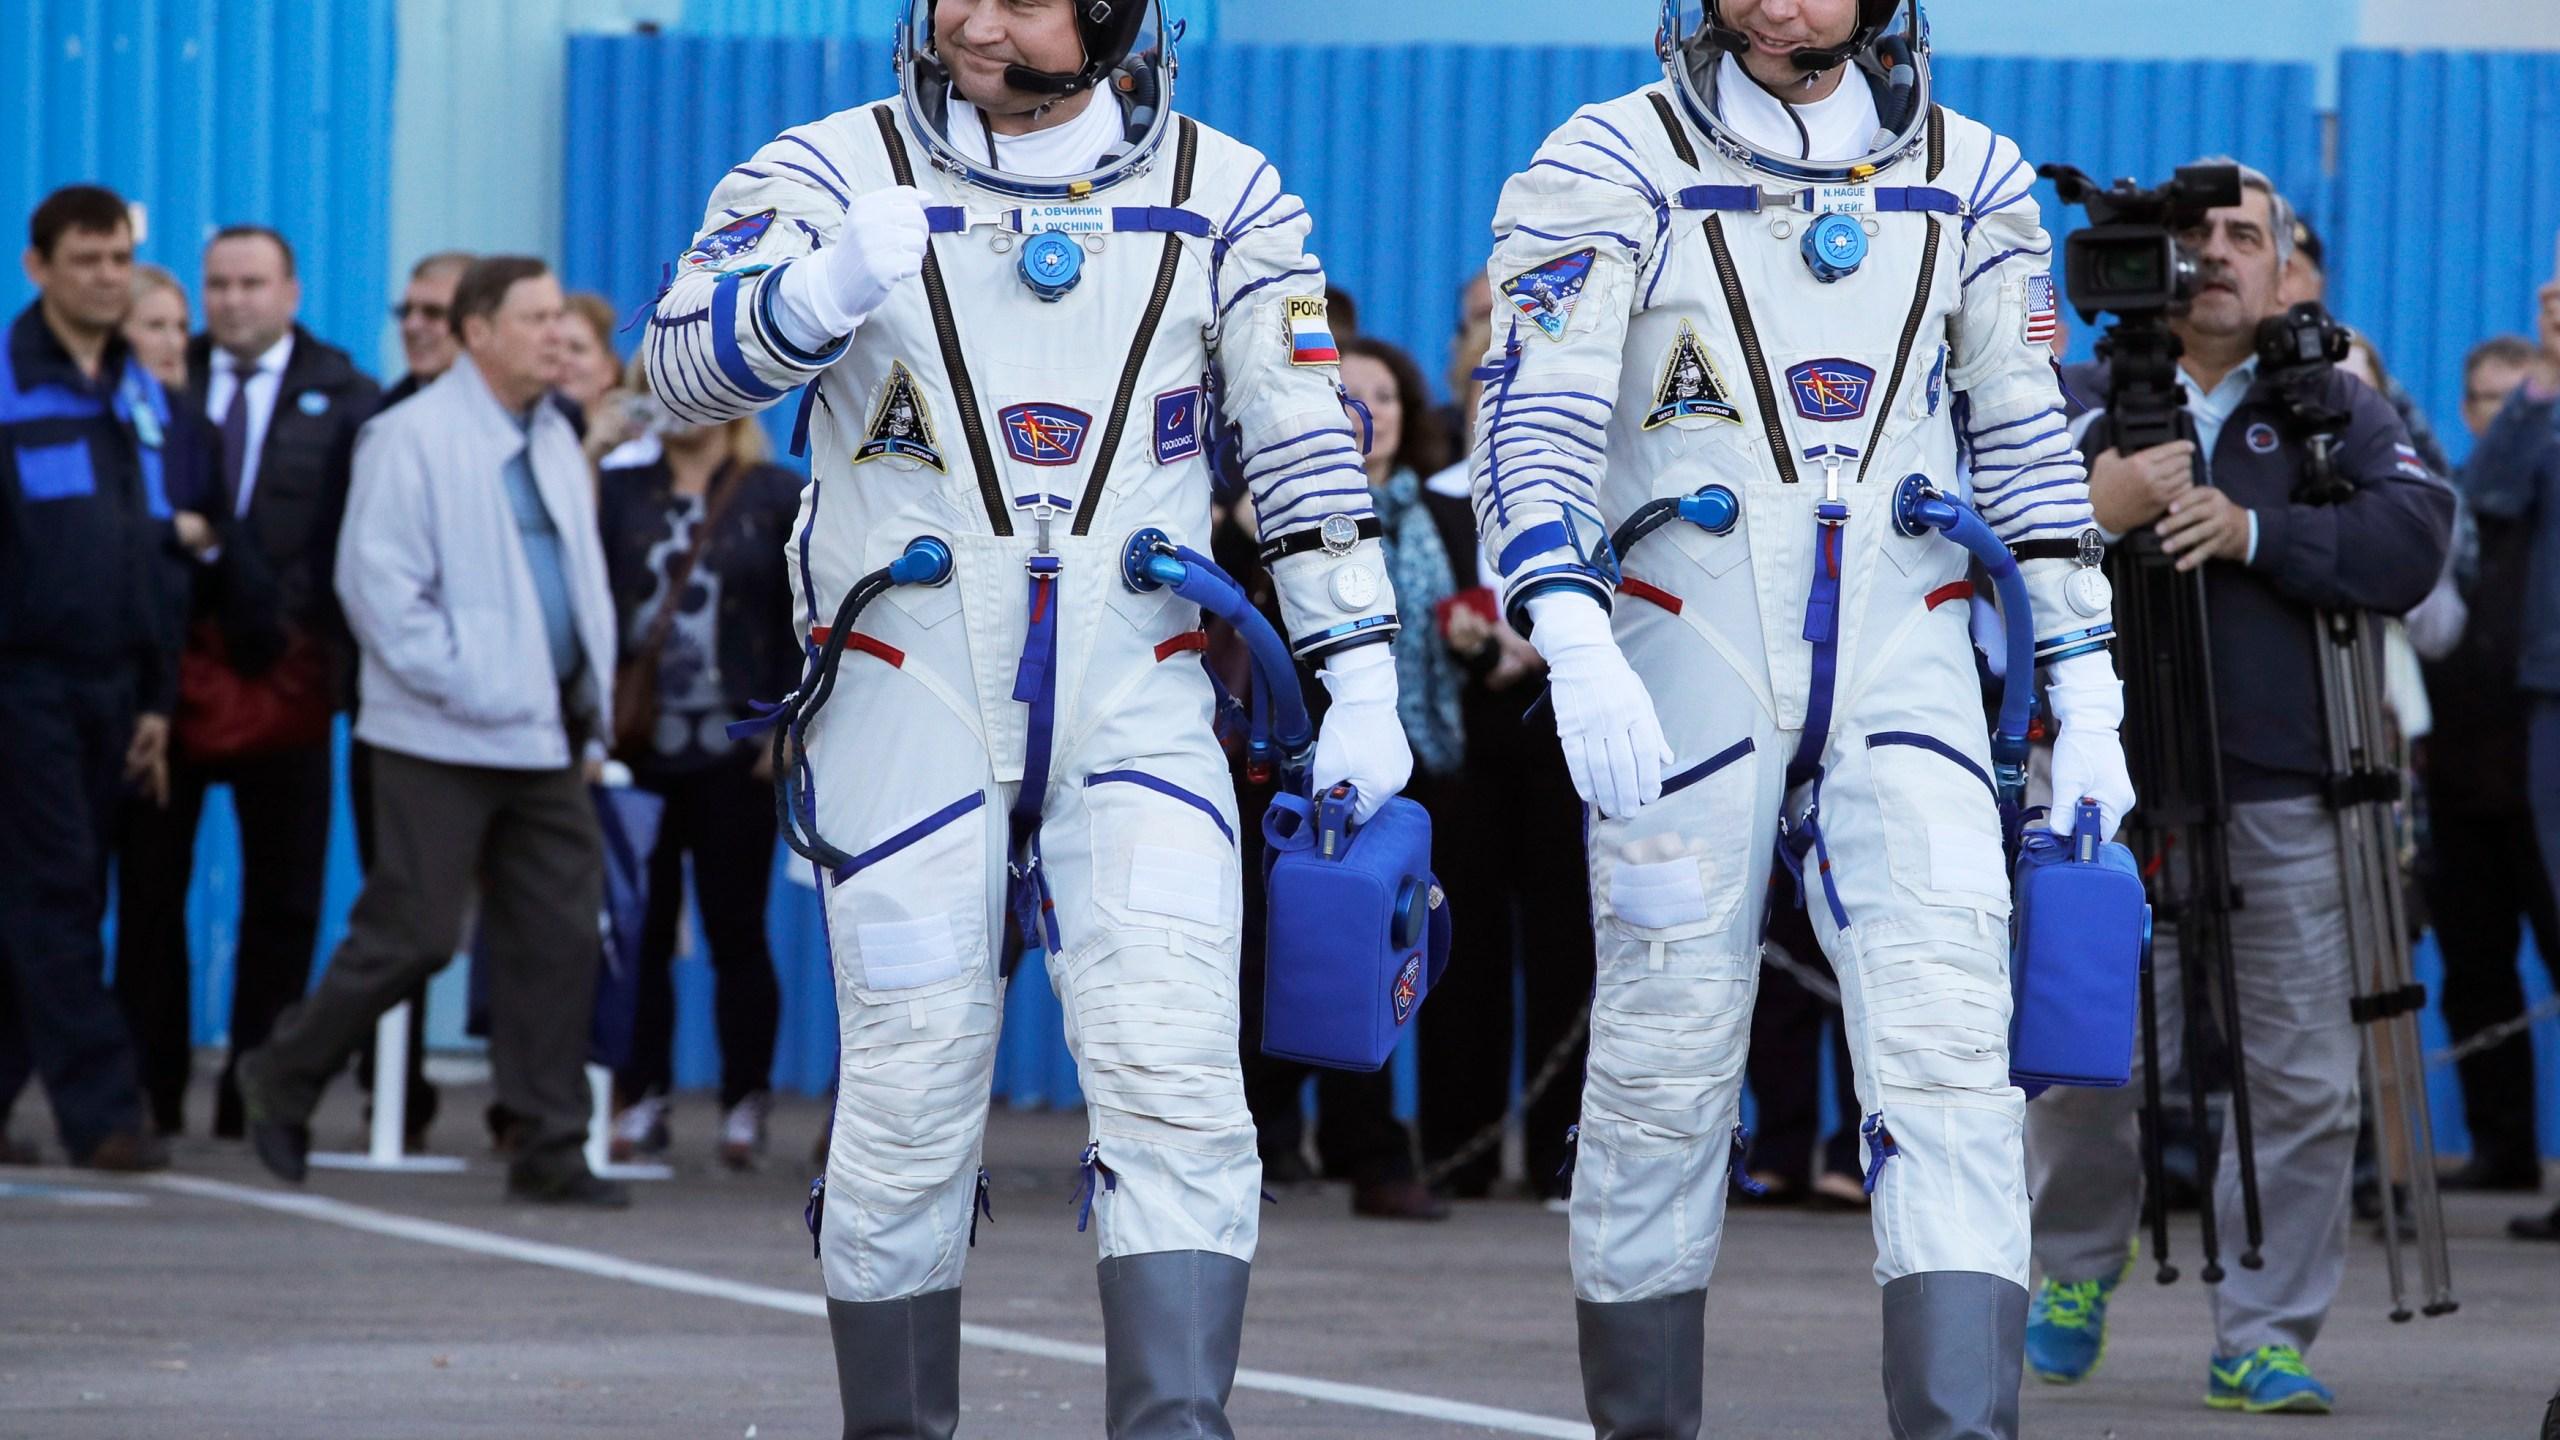 Kazakhstan Russia Space Station_1539251570260